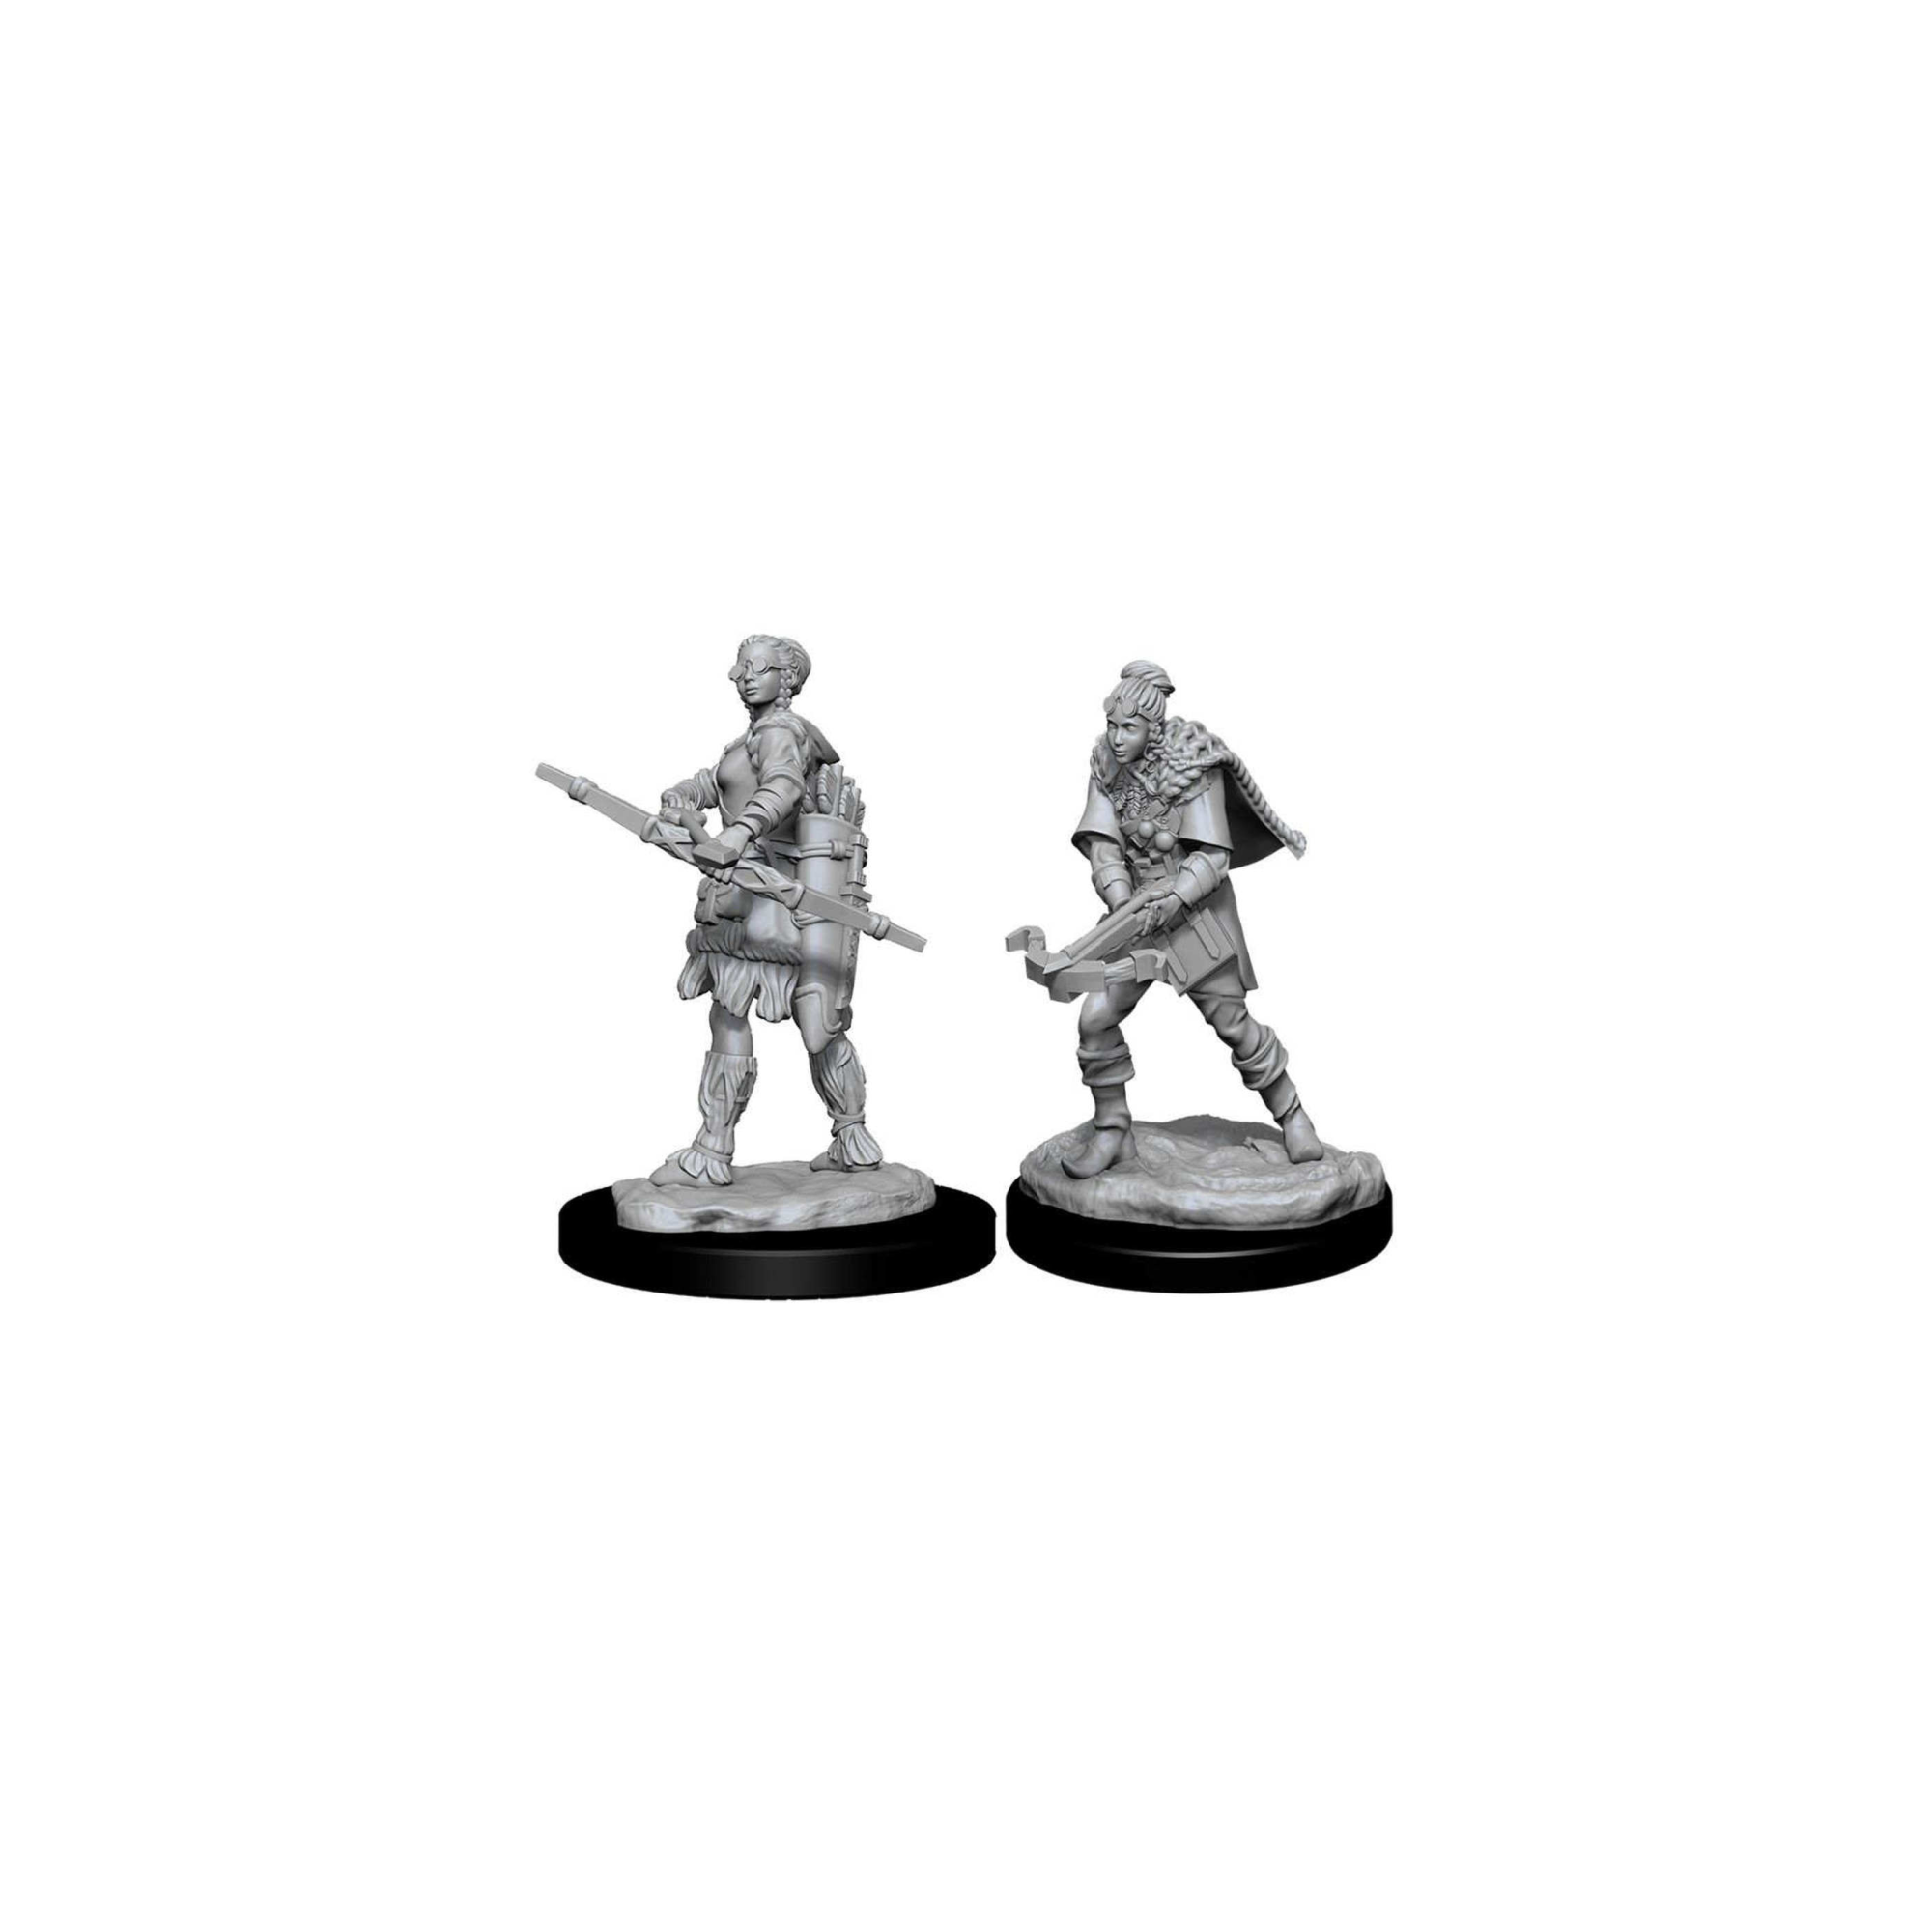 Wizkids Games D&D Dungeons & Dragons: Unpainted Minis WV11 Female Human Ranger